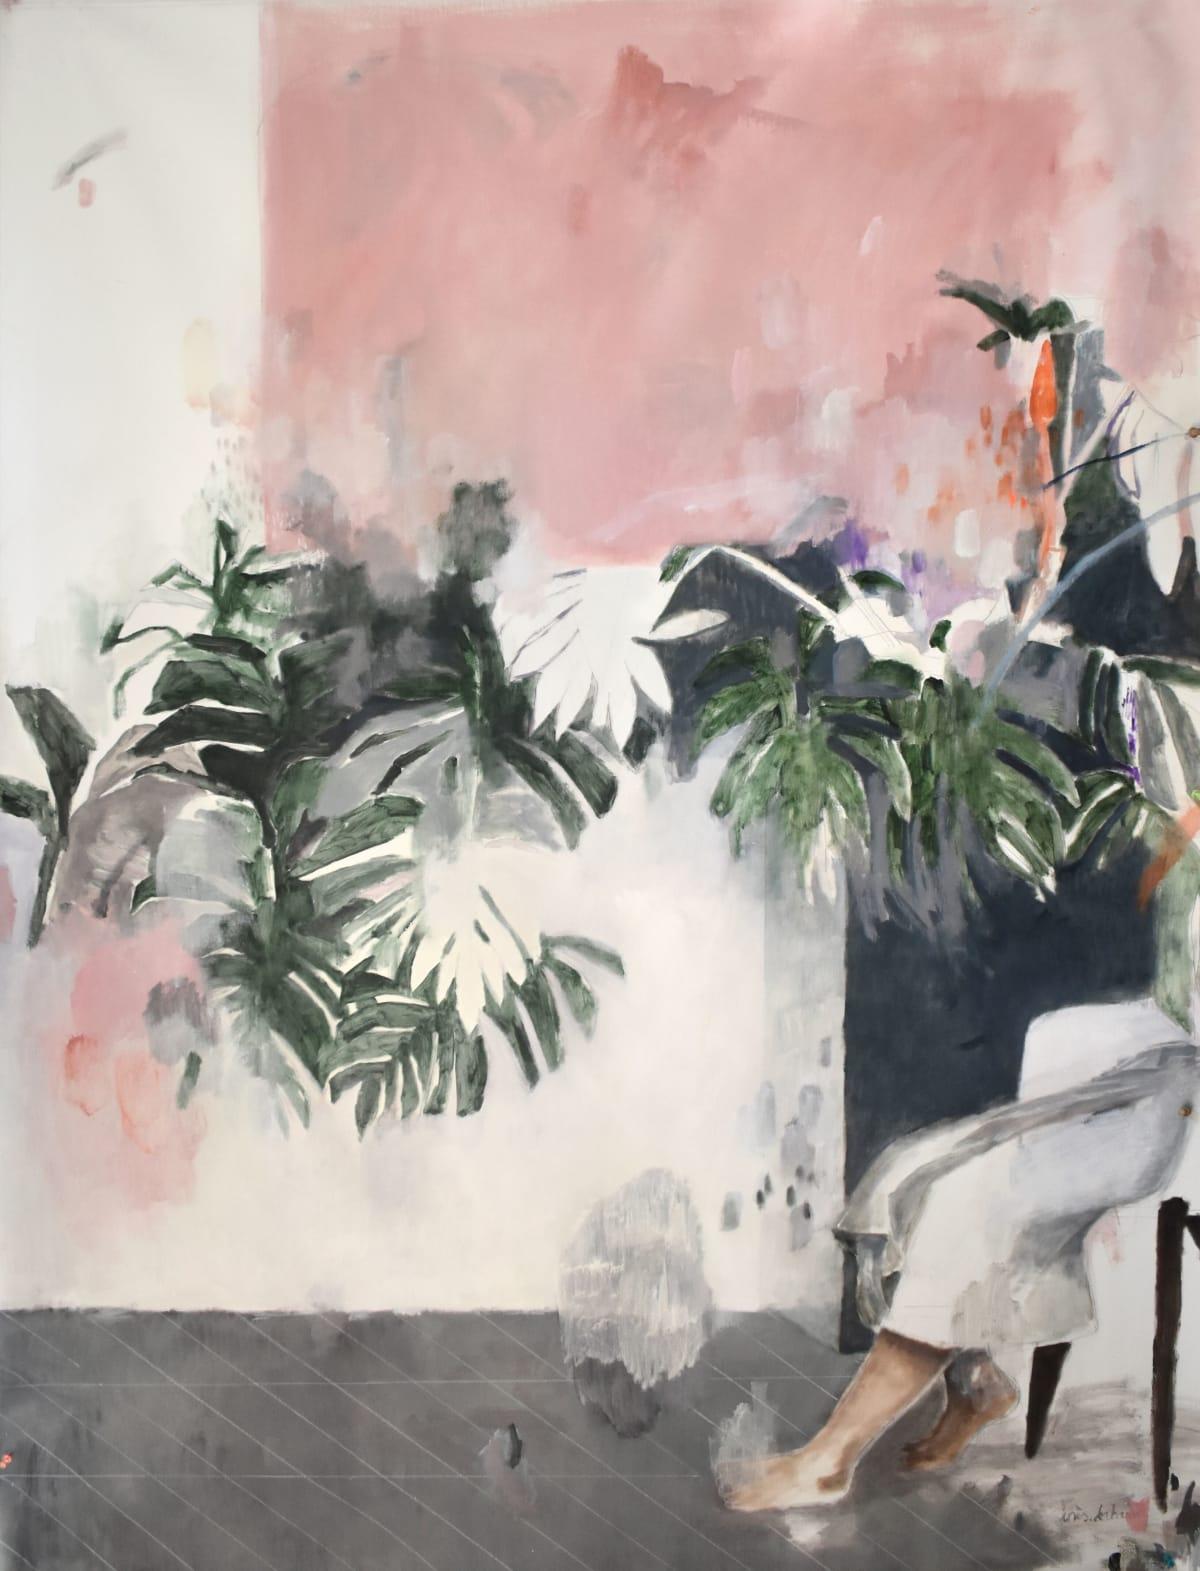 Ines Katamso, Contemplation 2, 2019